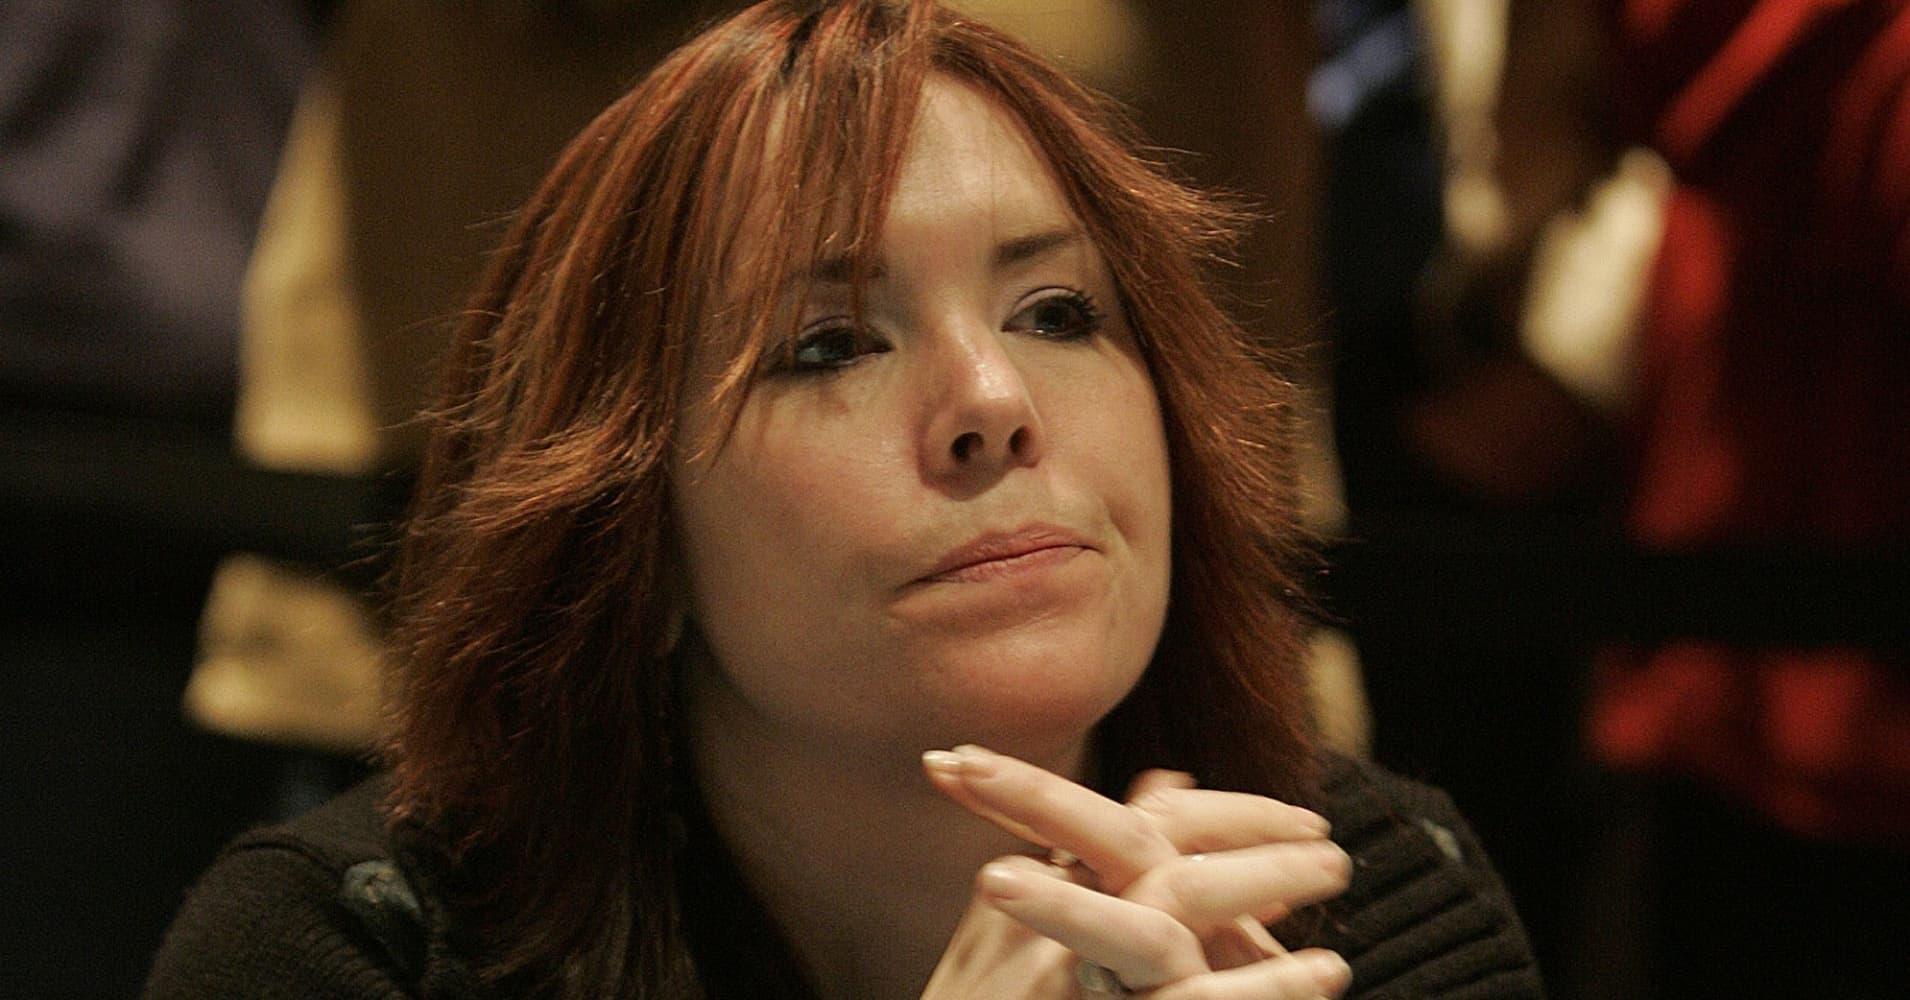 Annie Duke at the 2004 World Poker Finals